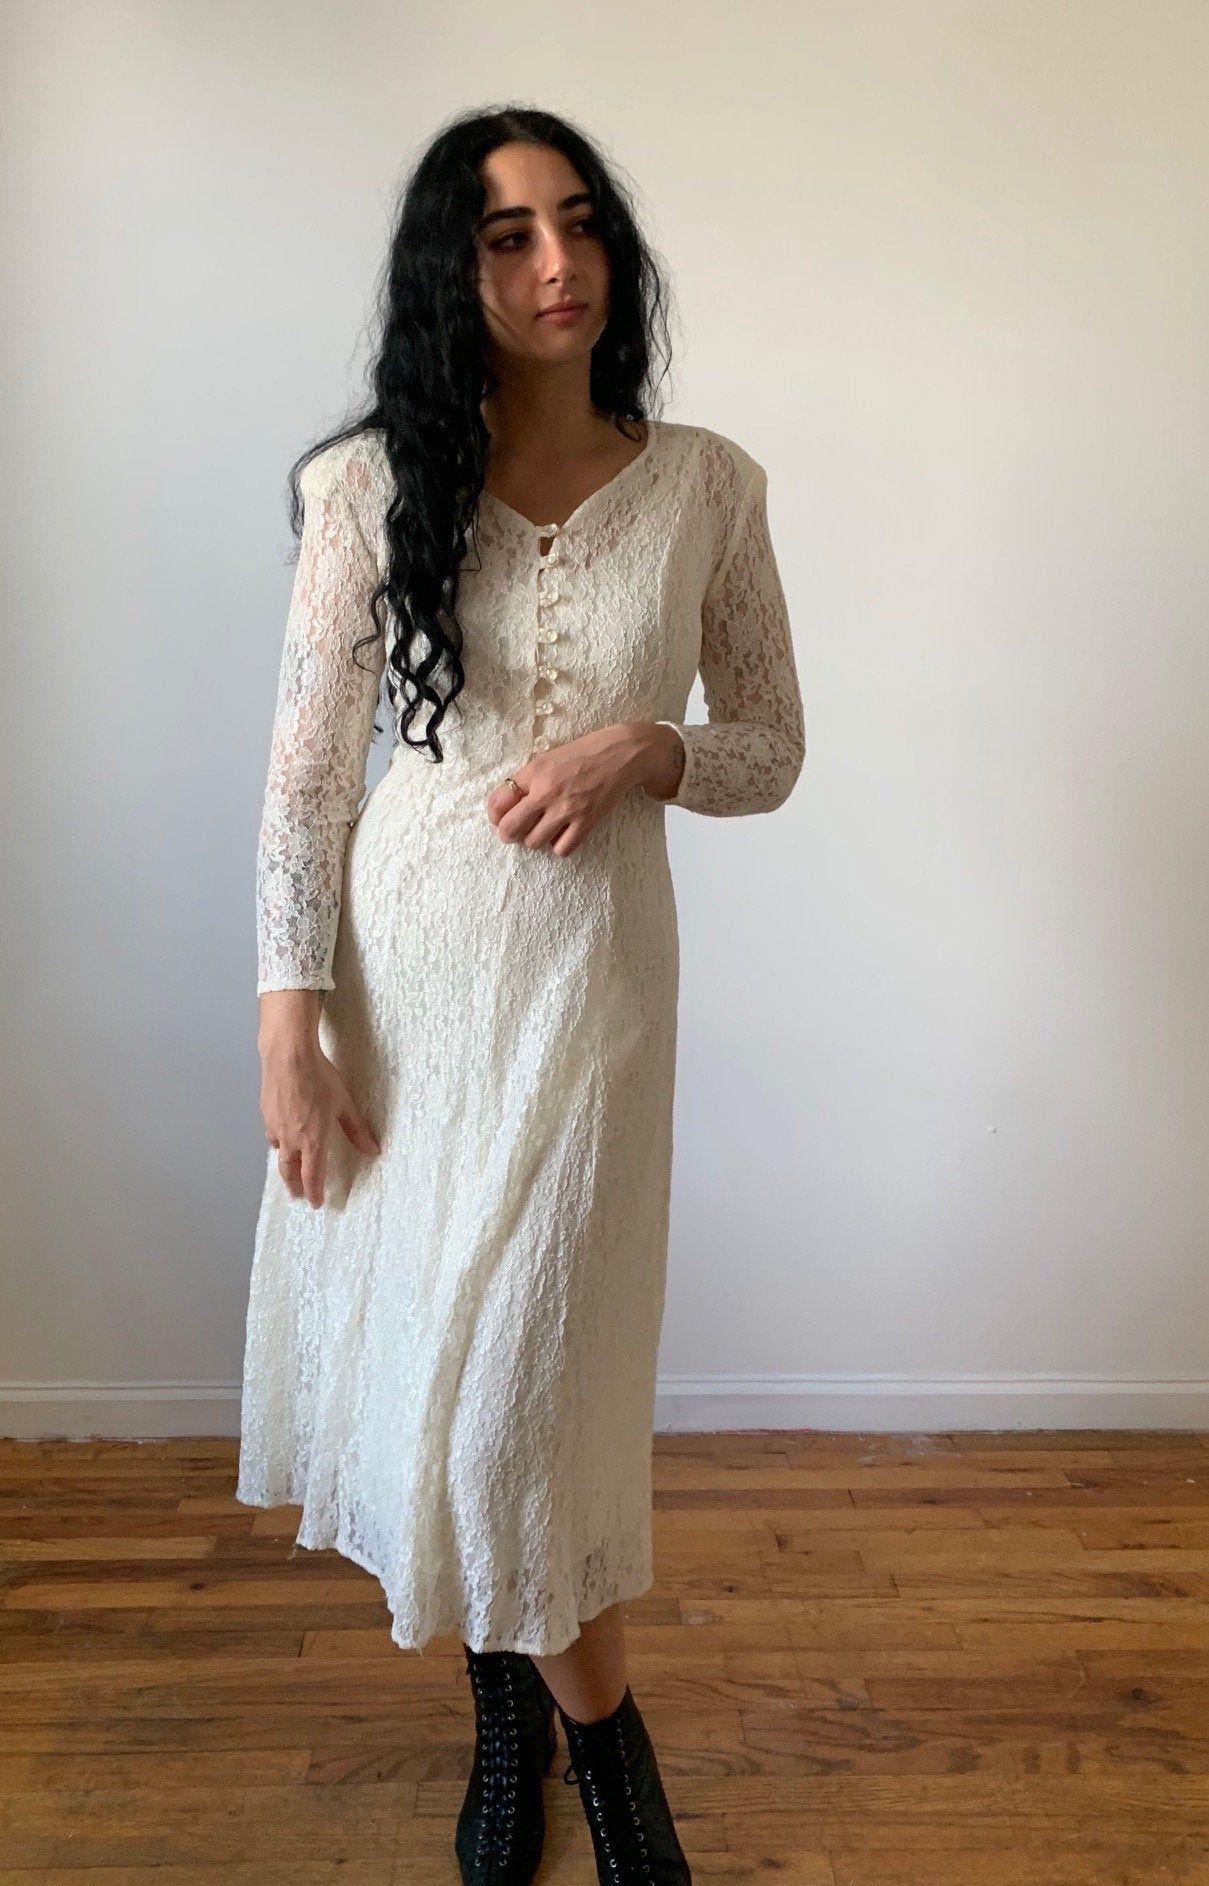 Vintage 80s 90s Dress Vintage All That Jazz Dress 1980s Etsy Lace White Dress Stretchy Lace Dress Lace Dress [ 1886 x 1209 Pixel ]